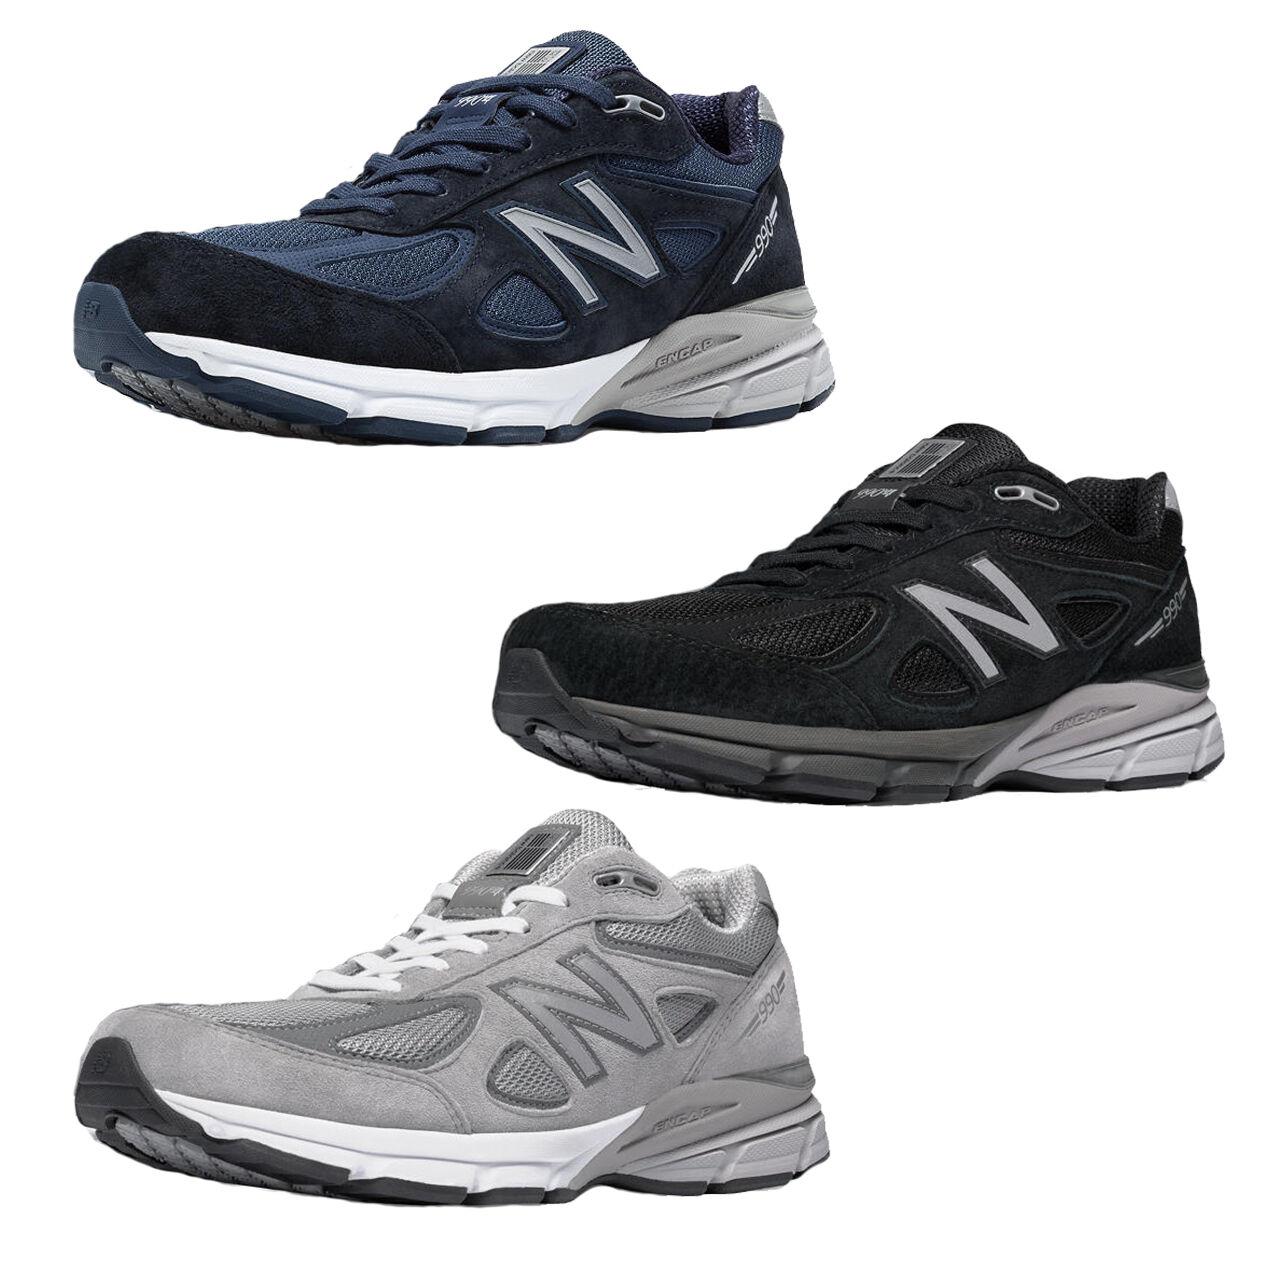 Men's New Balance M990v4 Running shoes M990NV4 M990BK4 M990GL4 D thru 6E USA Made